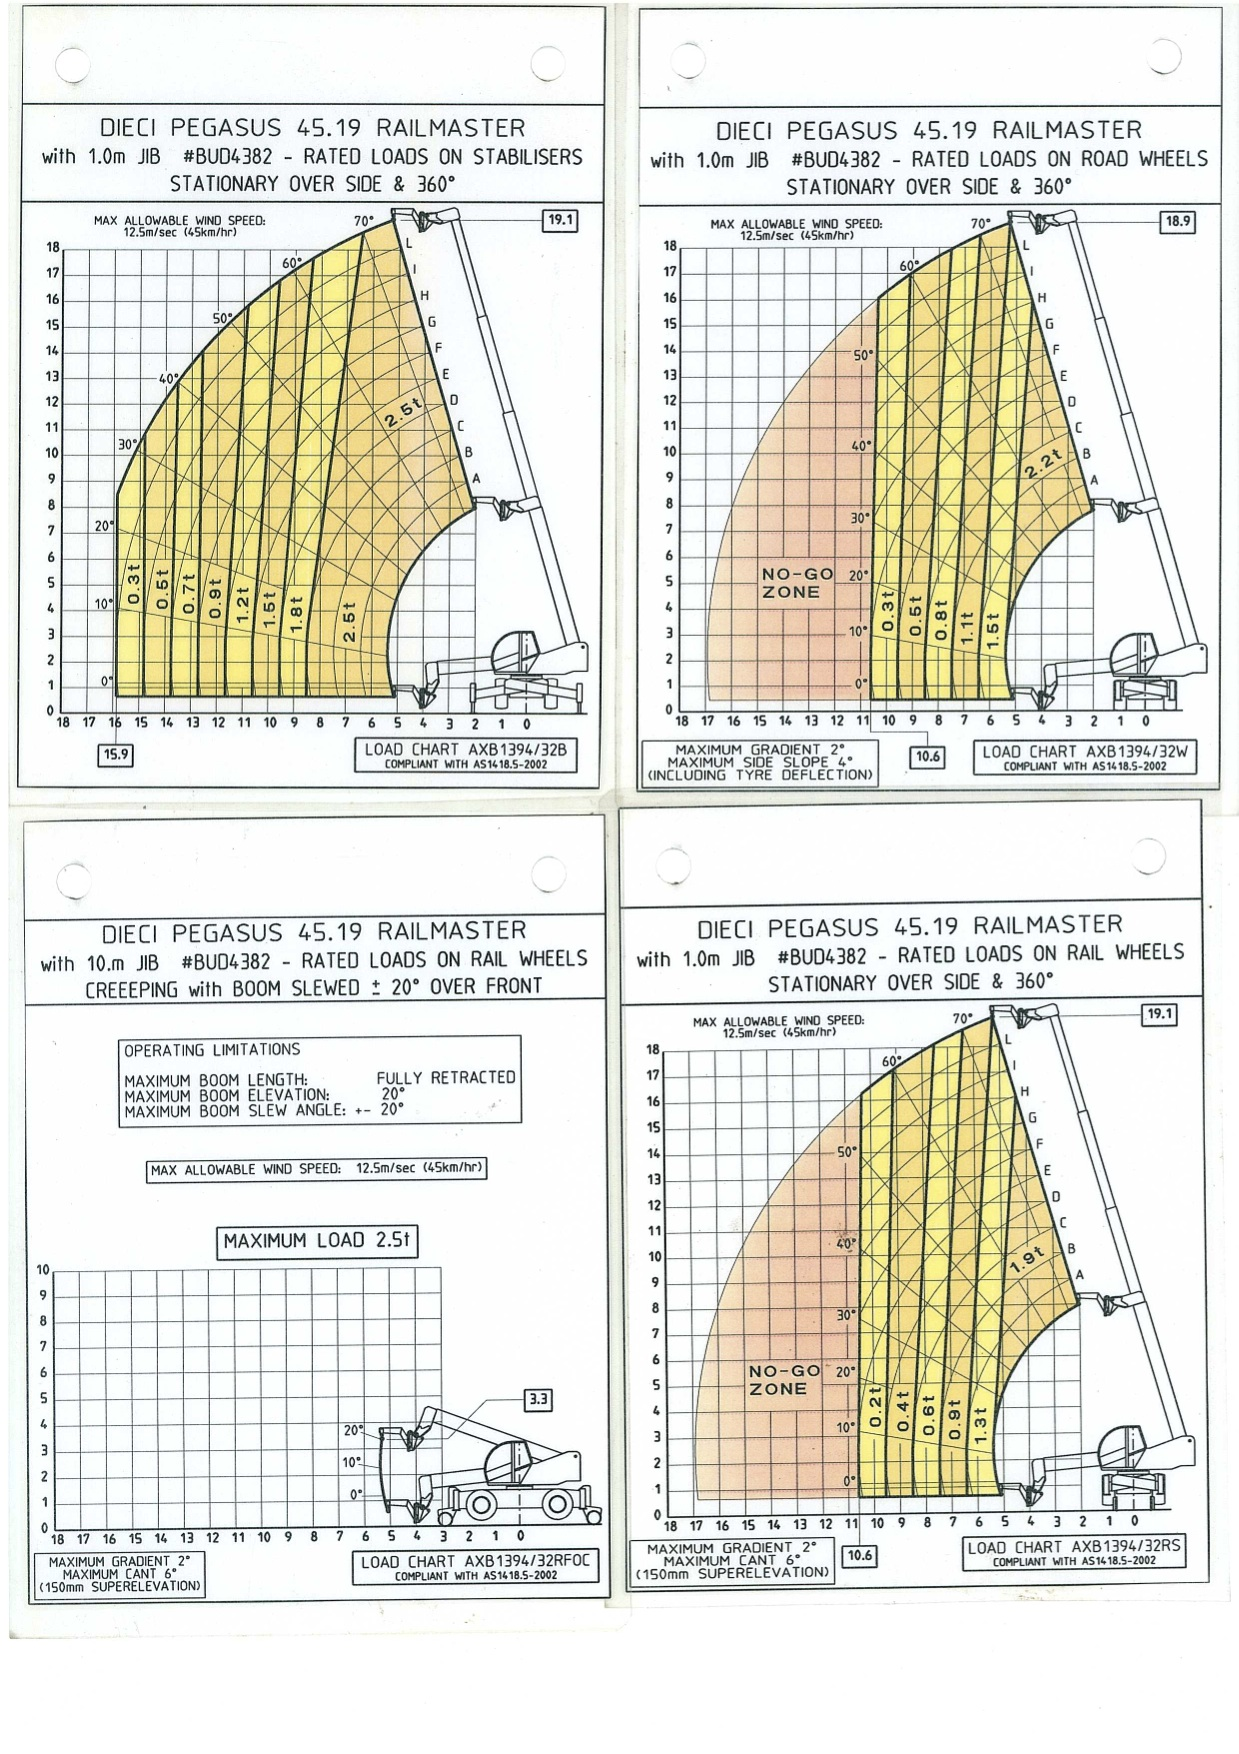 58577D-Dieci-PEGASUS-RAIL-MASTER-Telehandler-Load-Charts-6.jpg